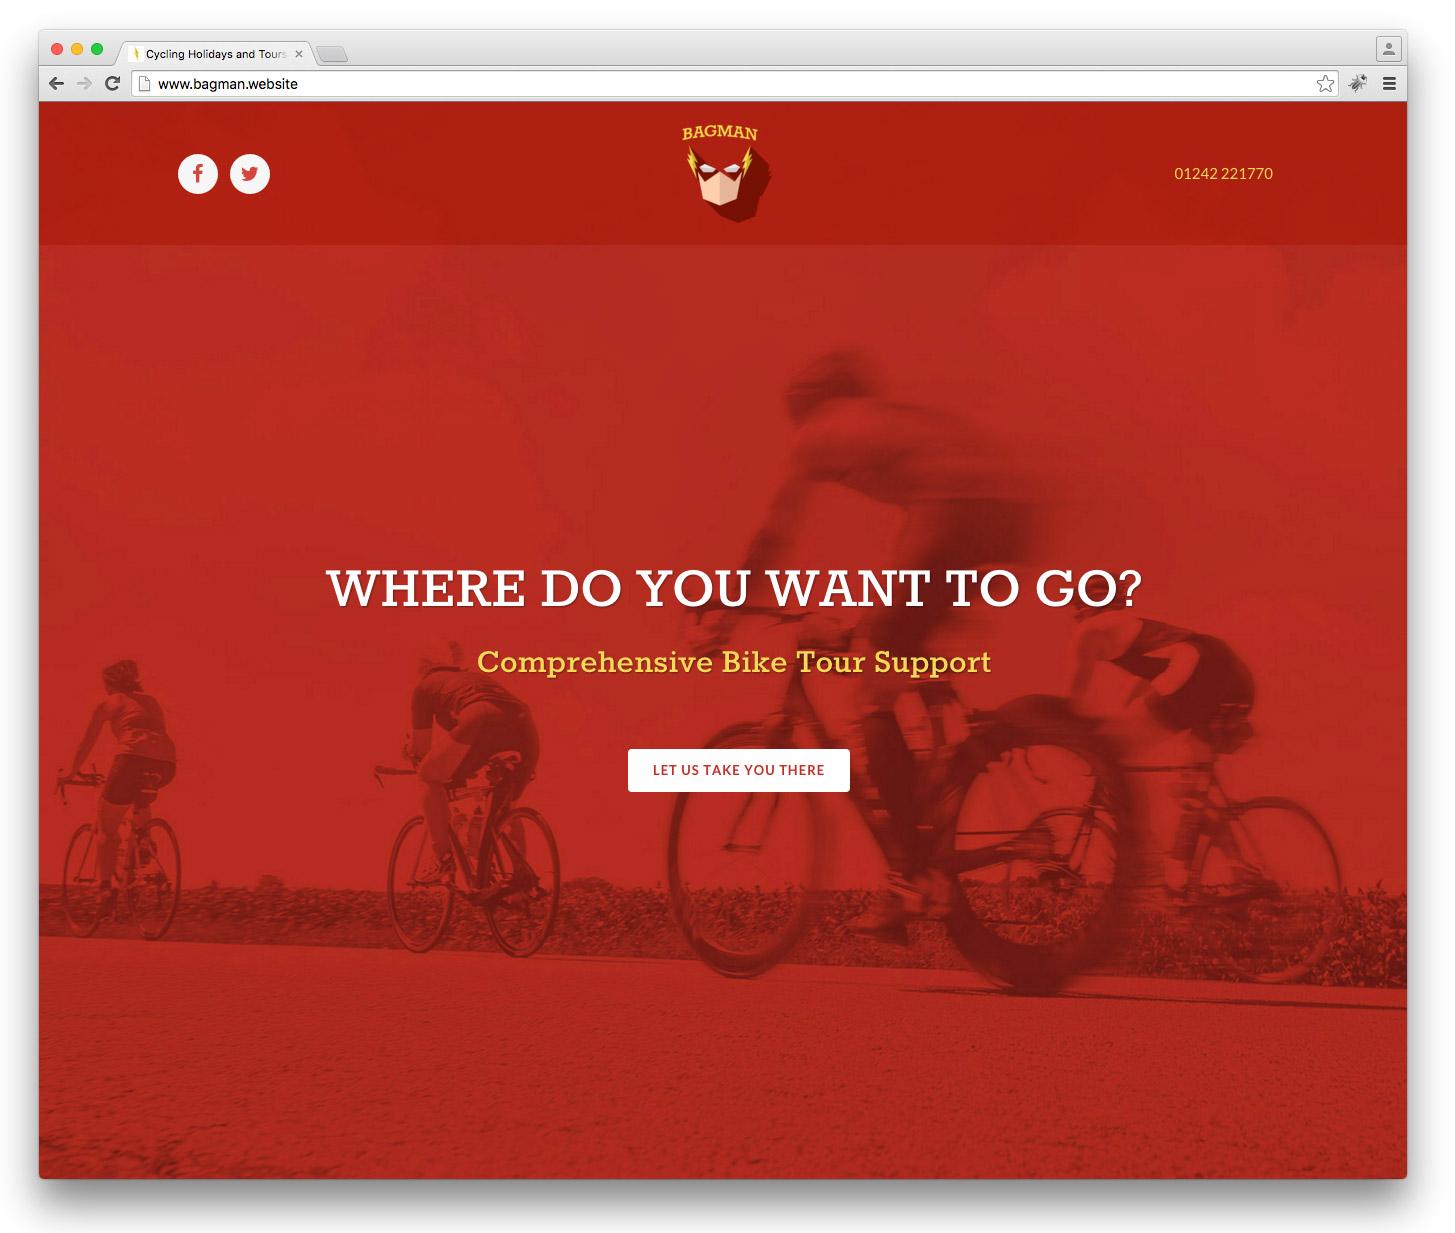 Bagman - Comprehensive Bike Tour Support